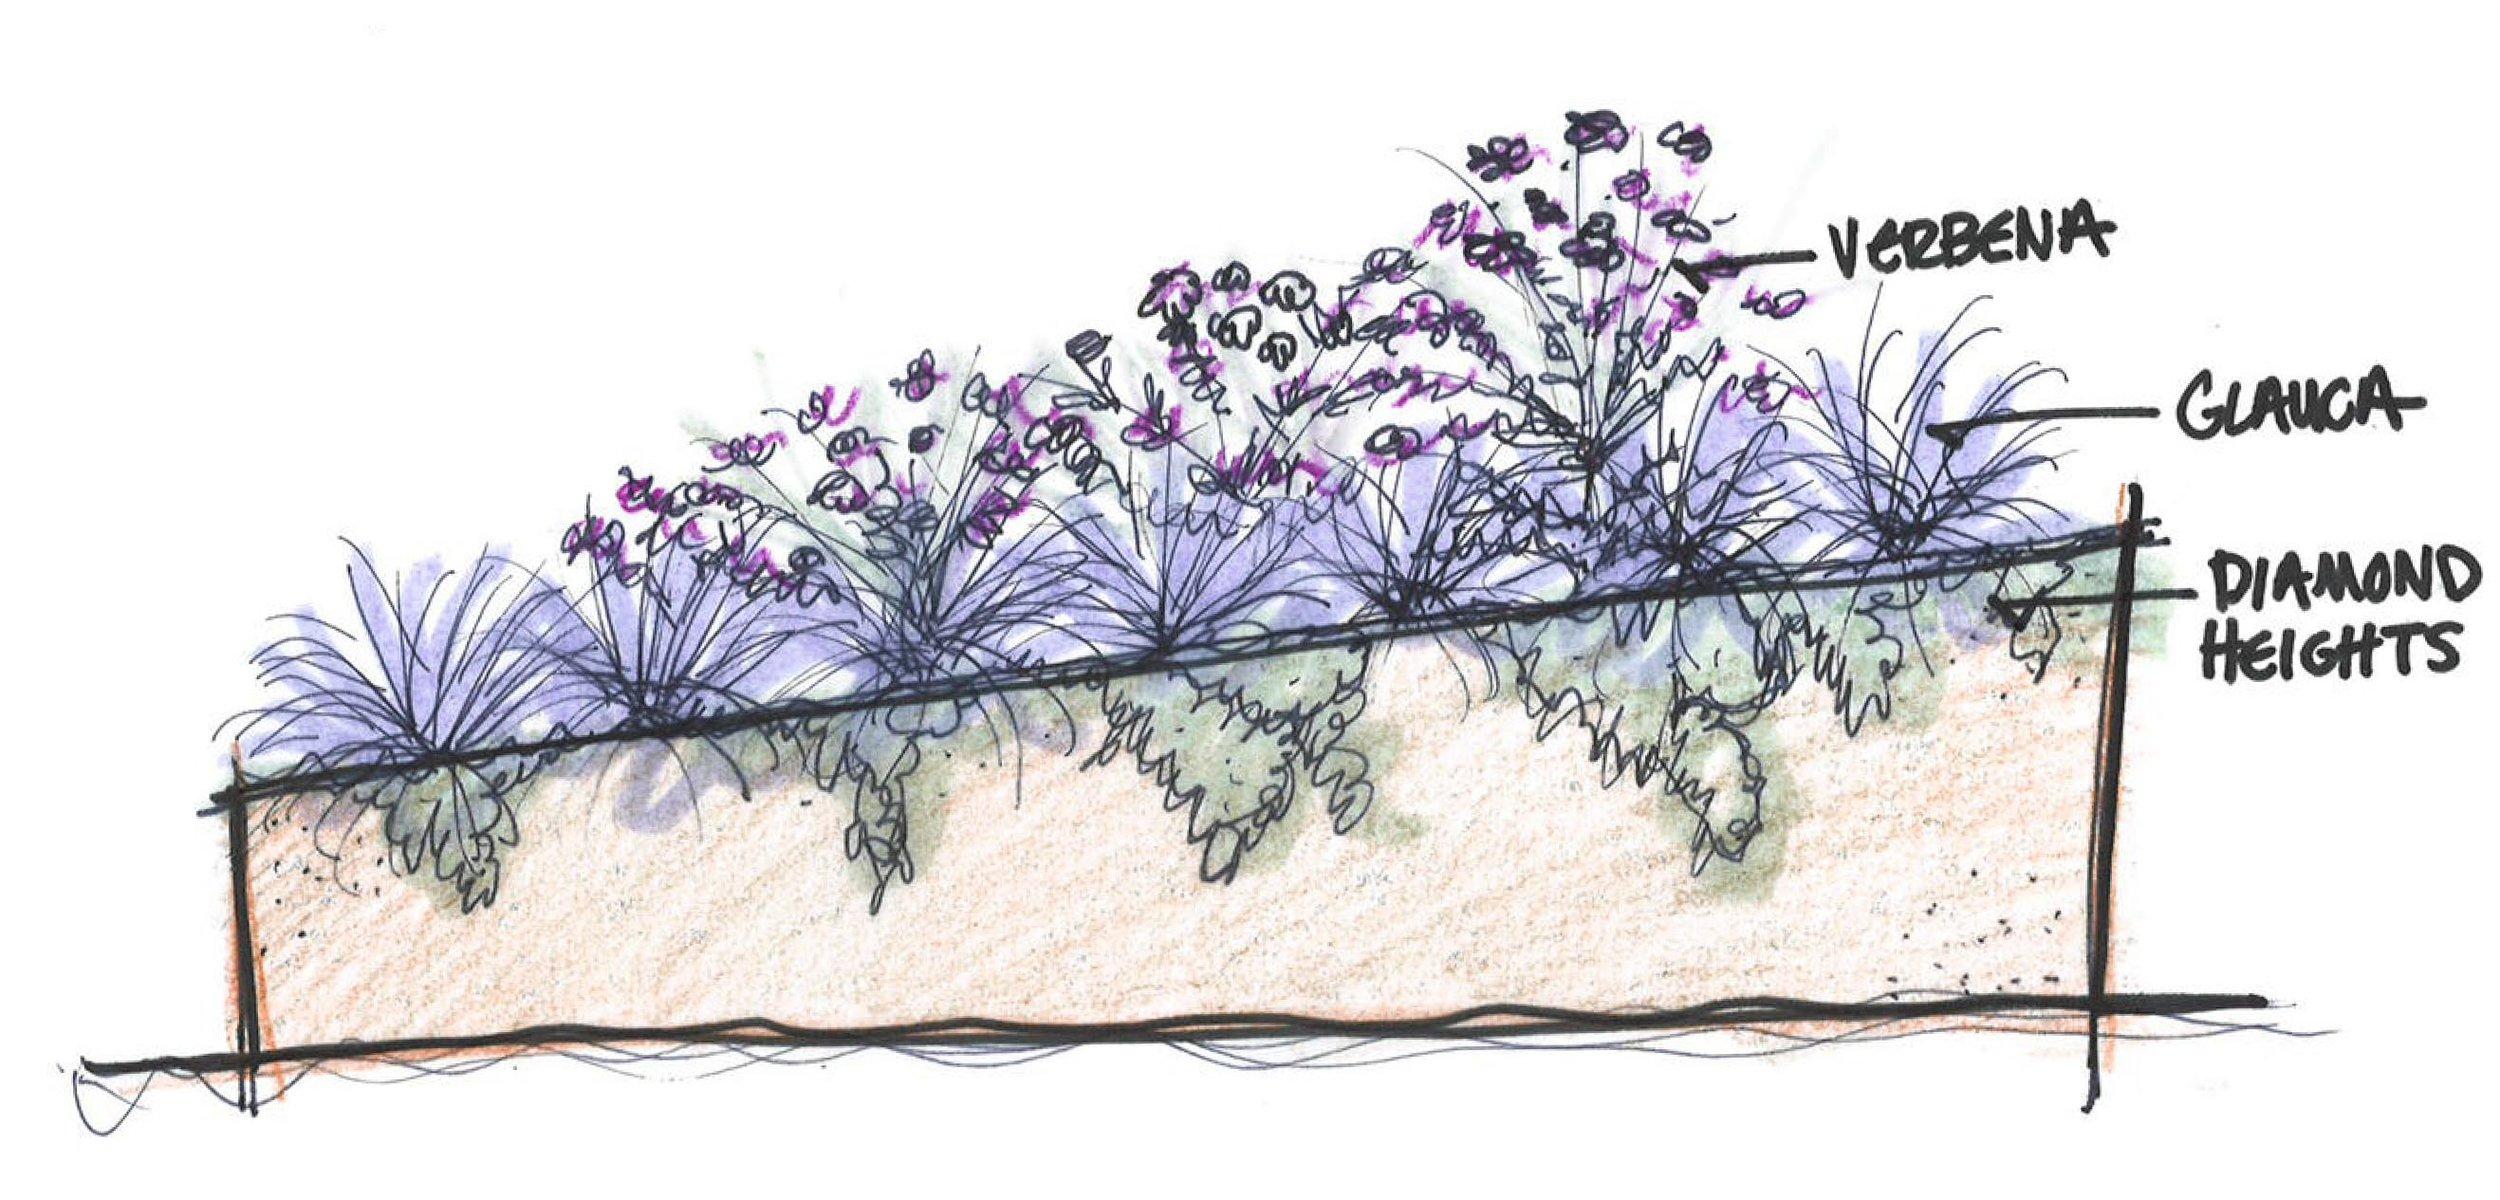 corten sketch with planting.jpg